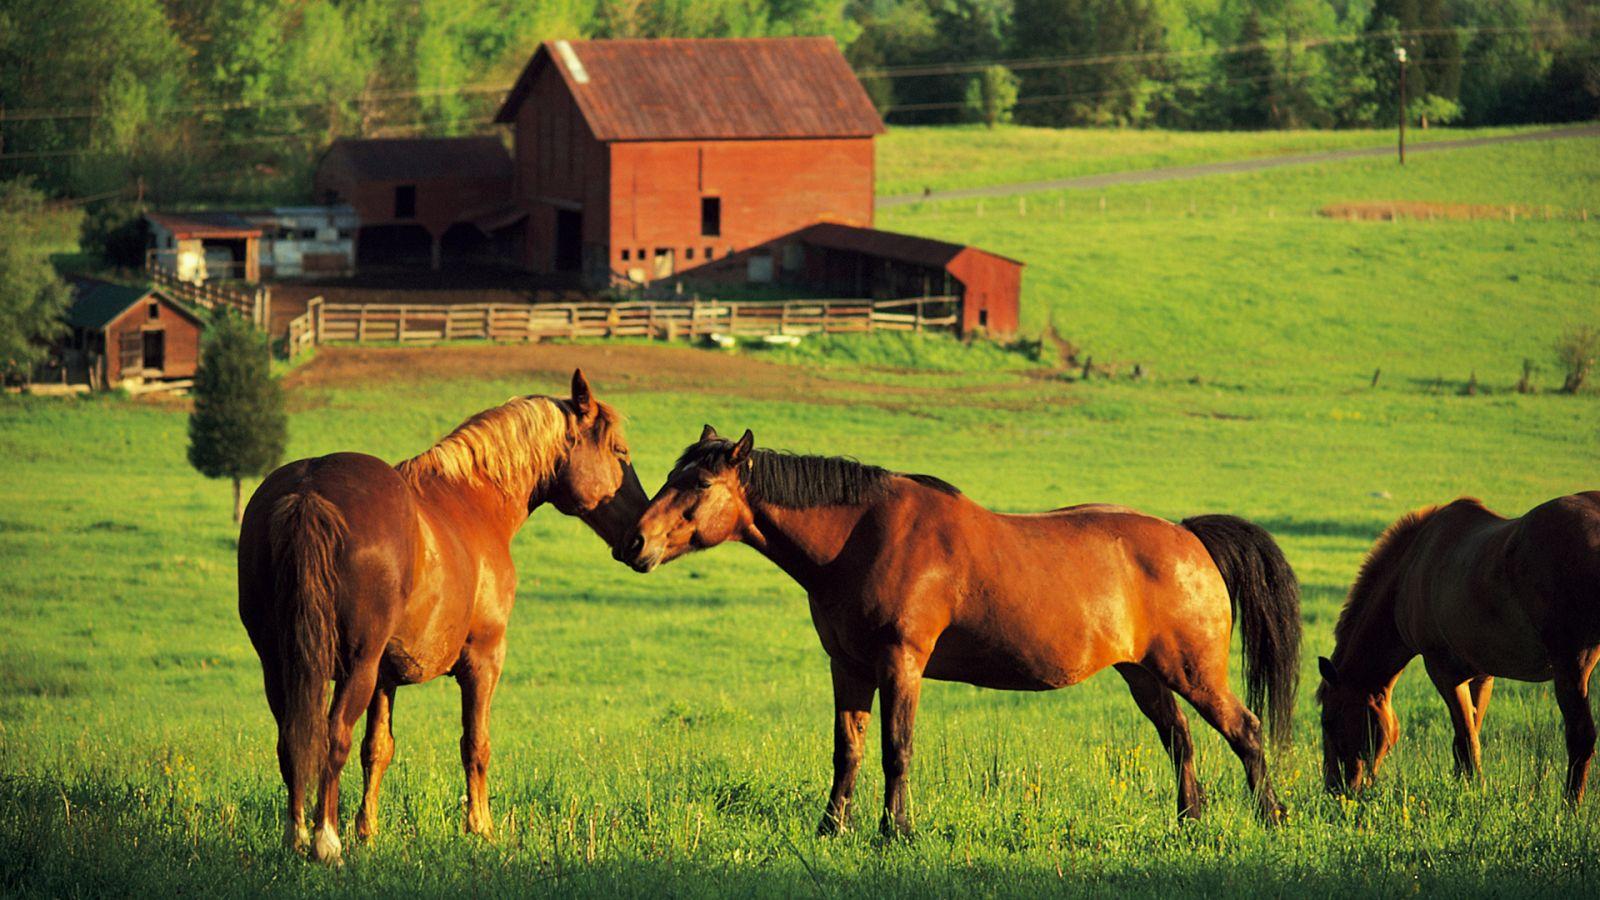 Horse hd wallpaper 1600x900 wallpapersafari for Horse farm